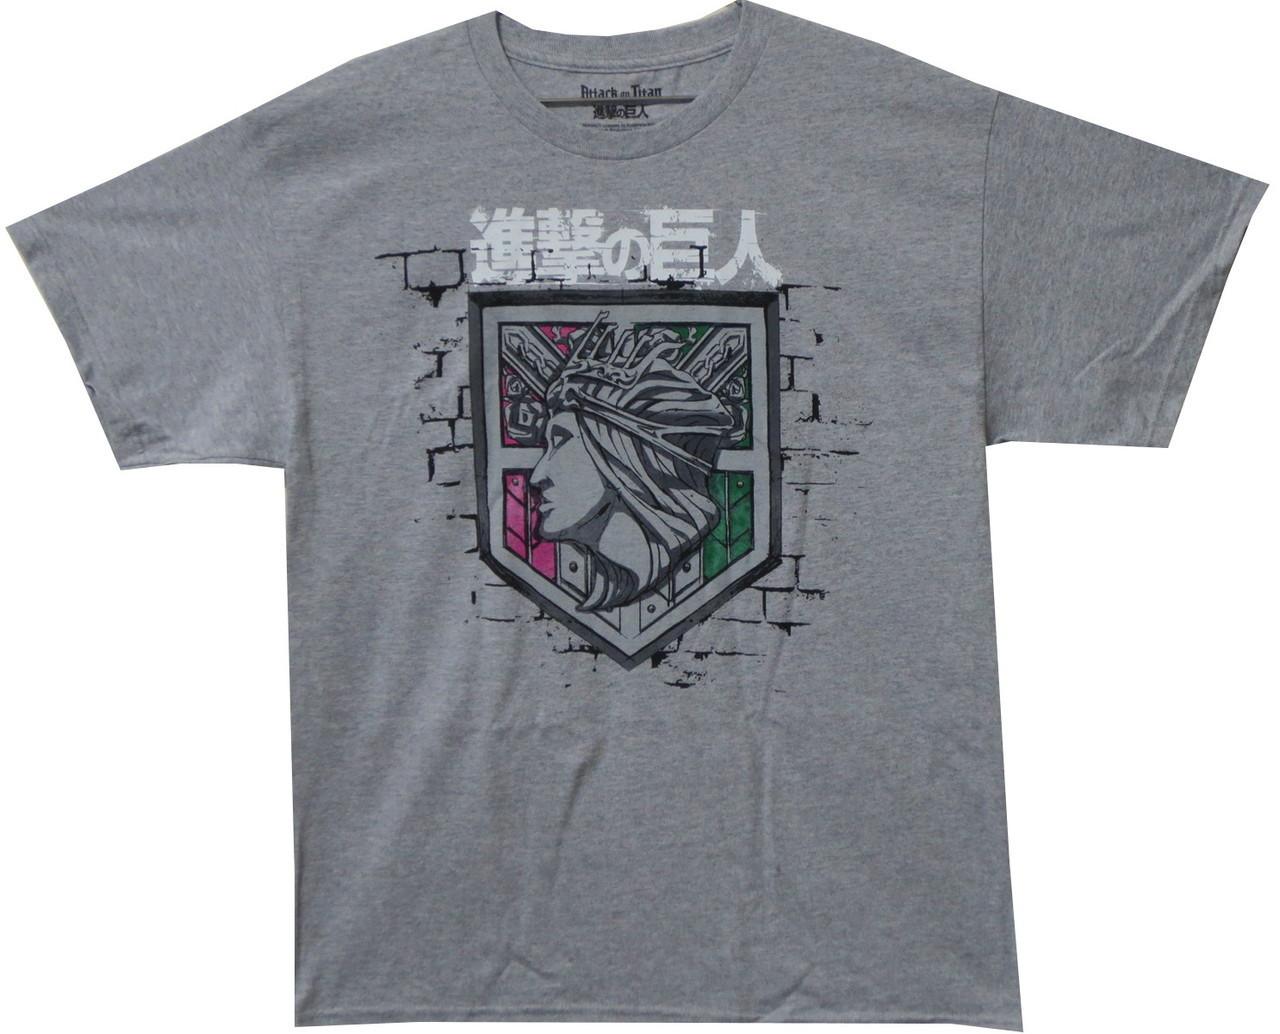 d7a283ca2 Attack on Titan T-Shirt - Wall Rose Logo - NerdKungFu